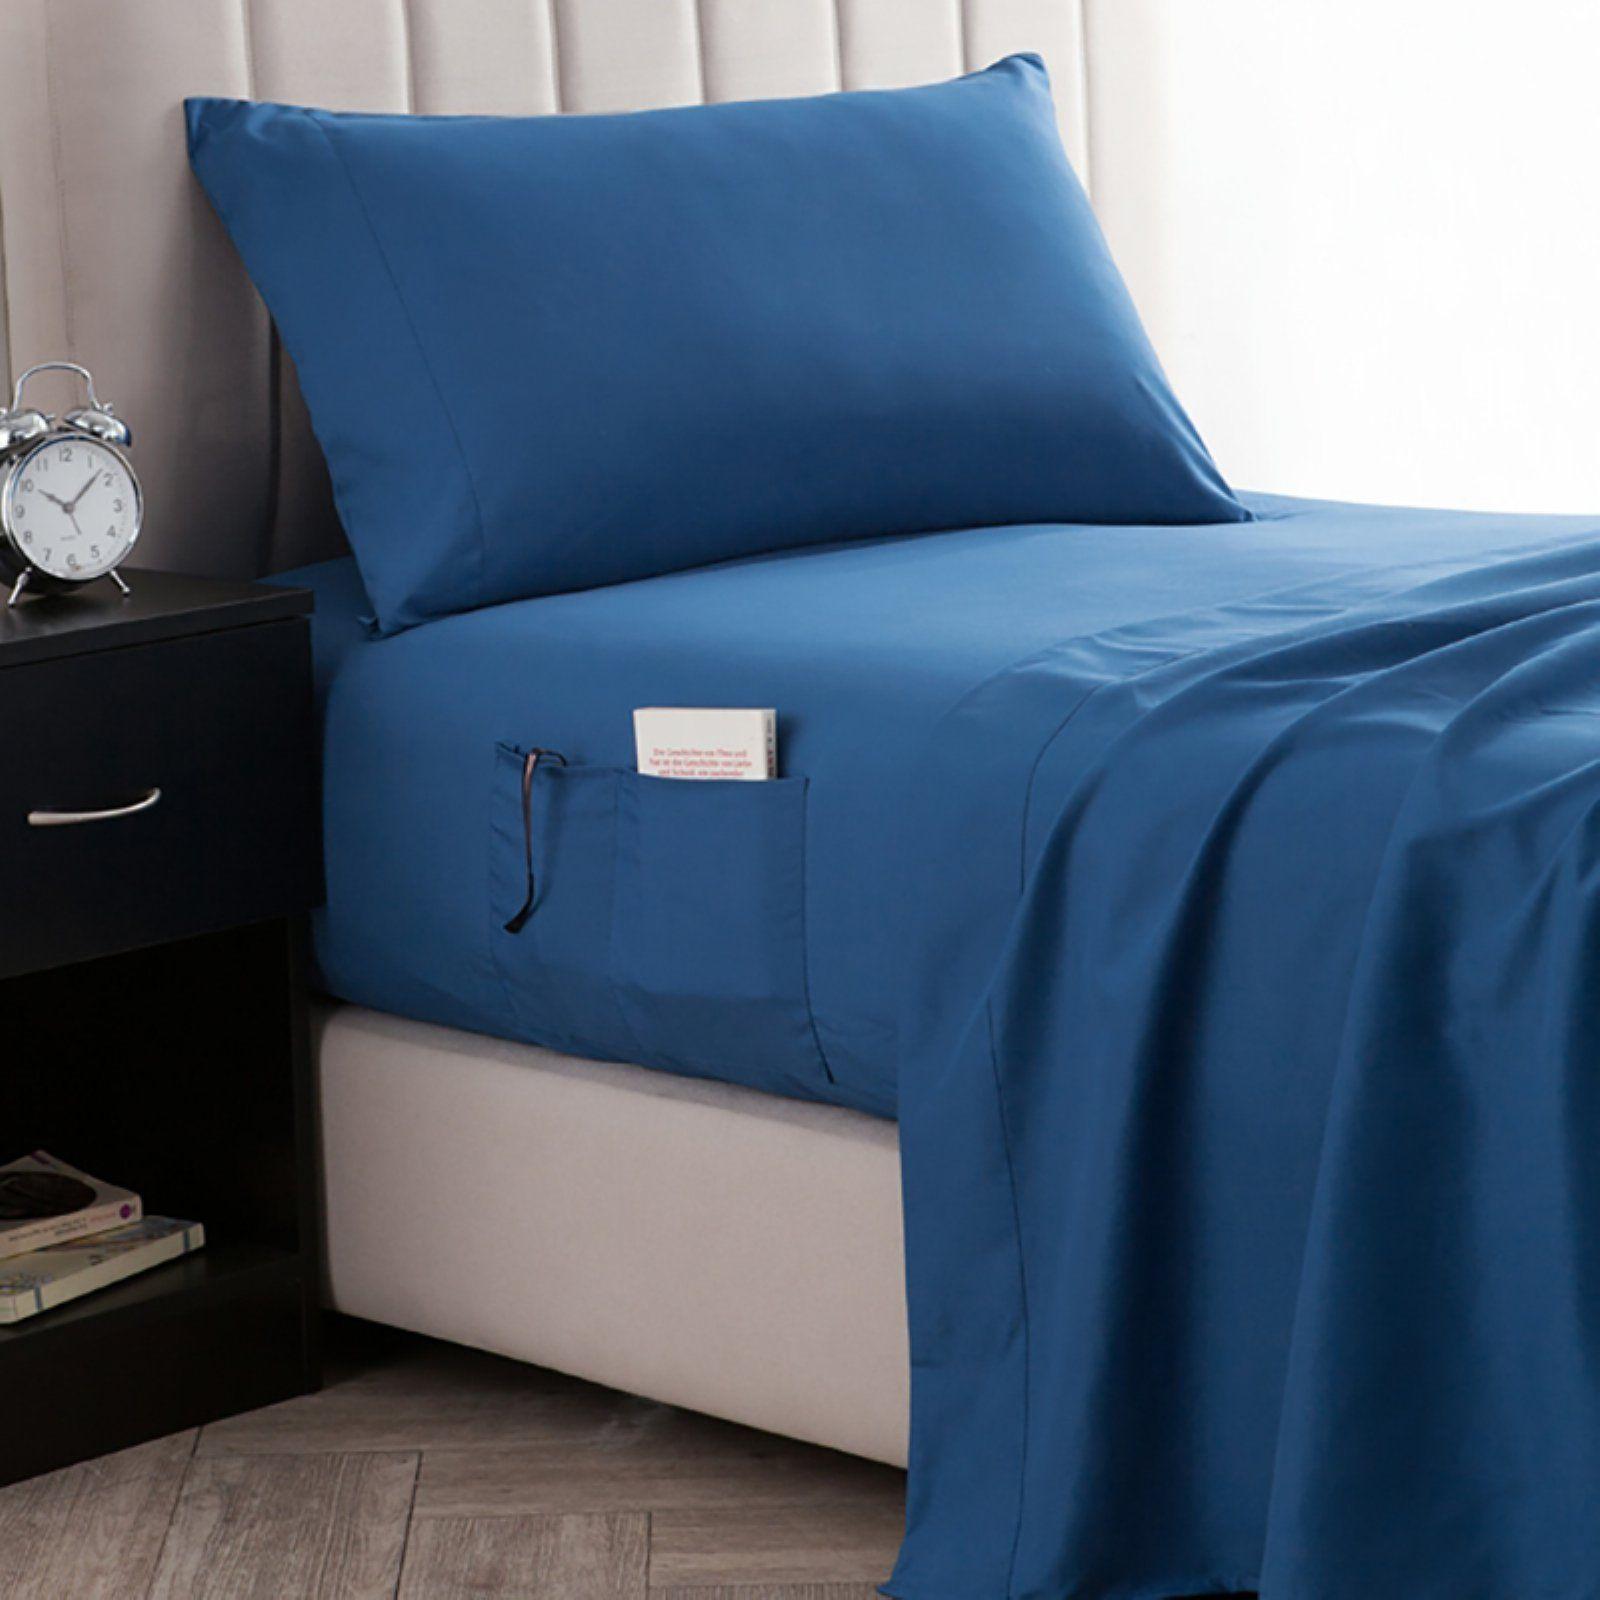 Bedside Pocket Sheet Set By Byourbed Glacier Gray Size Full Xl